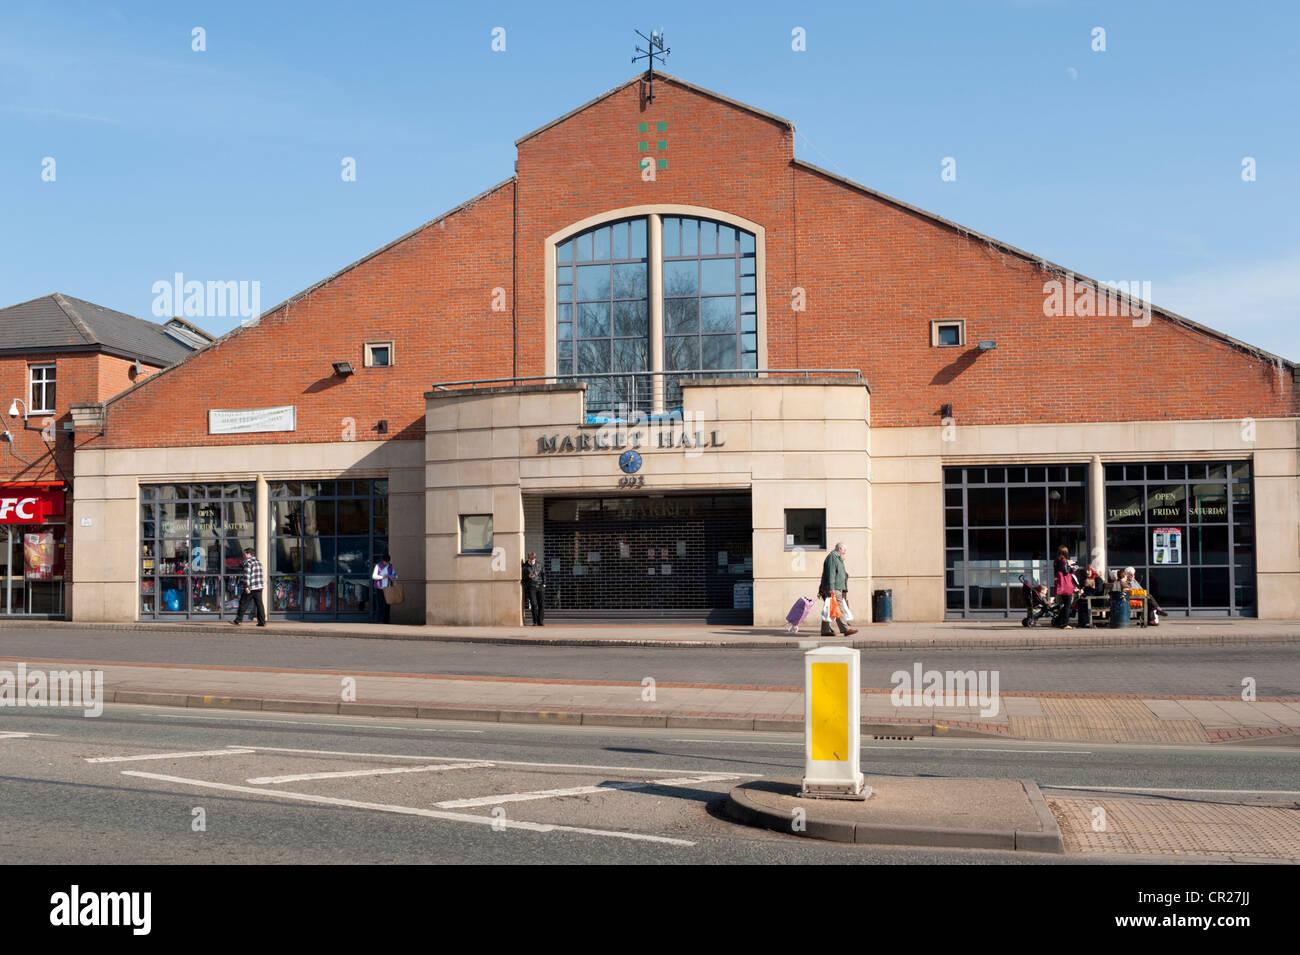 The Market Hall, Market Harborough, Leicestershire, England, UK - Stock Image